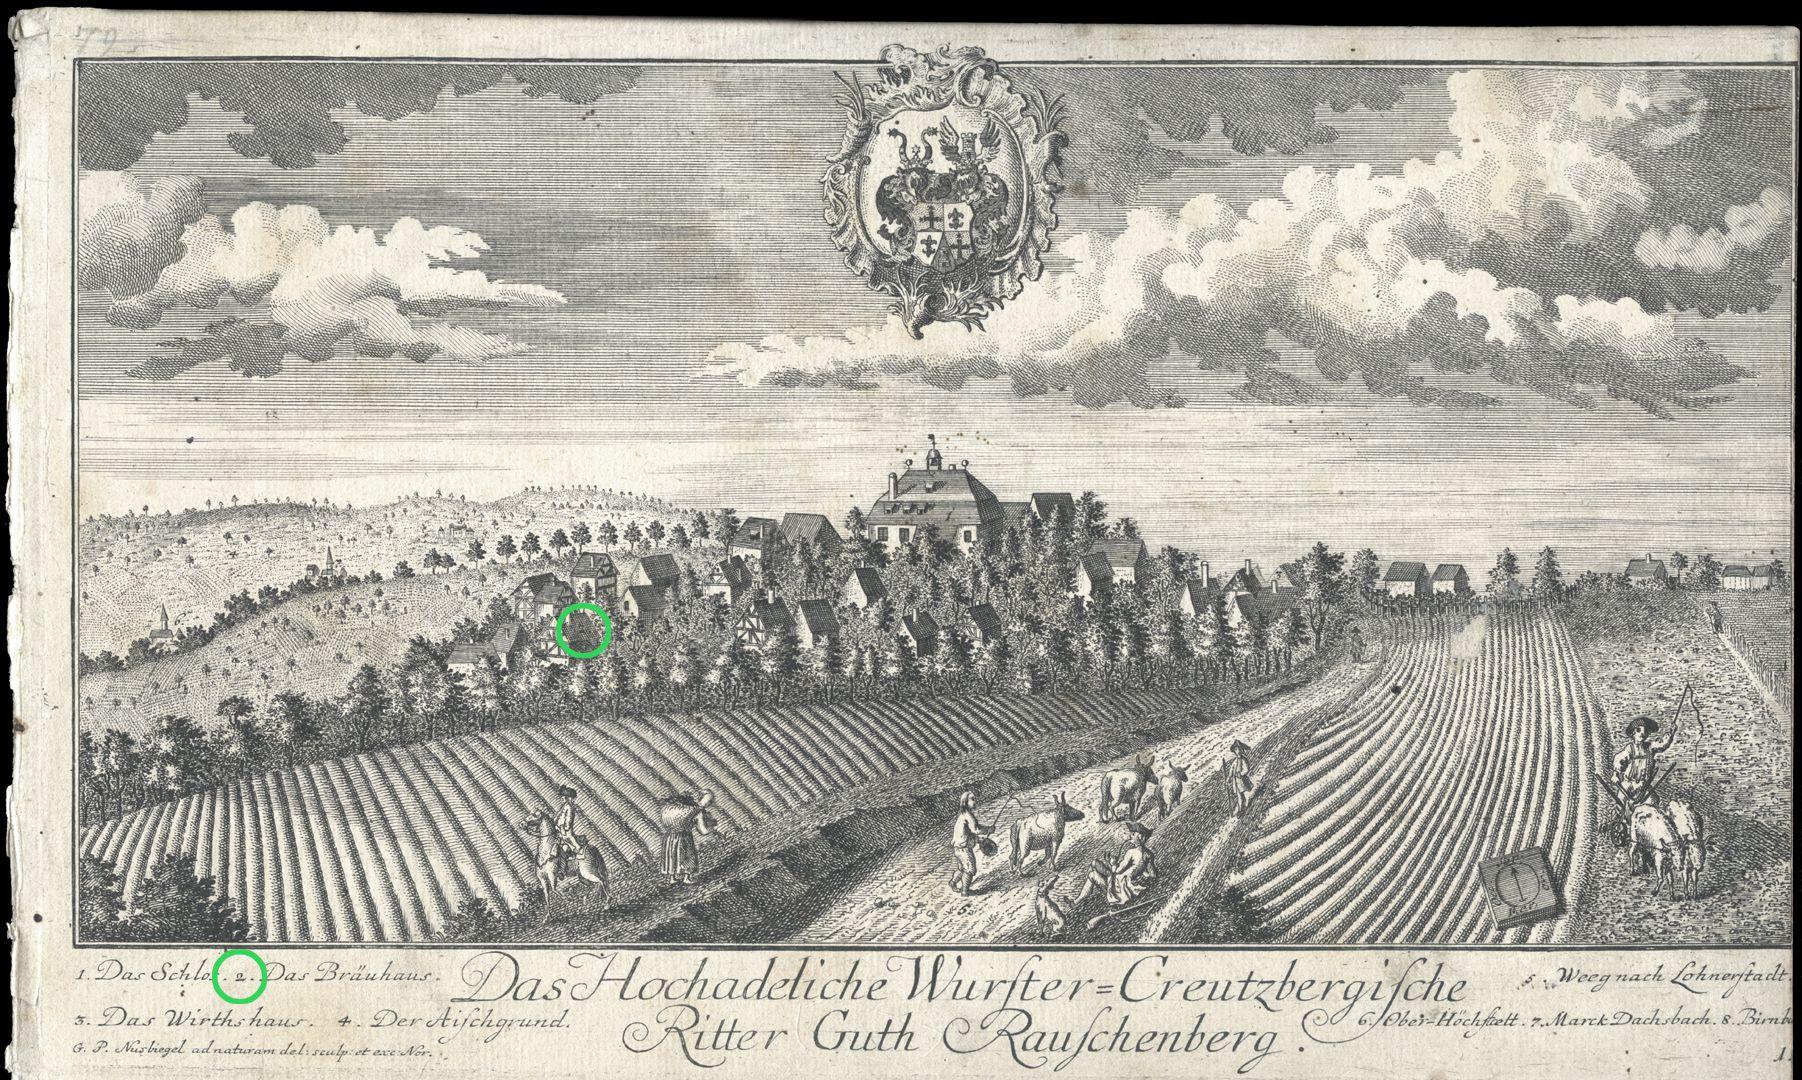 High-nobility-manor Rauschenberg of Wurster-Creutzberg Brewery